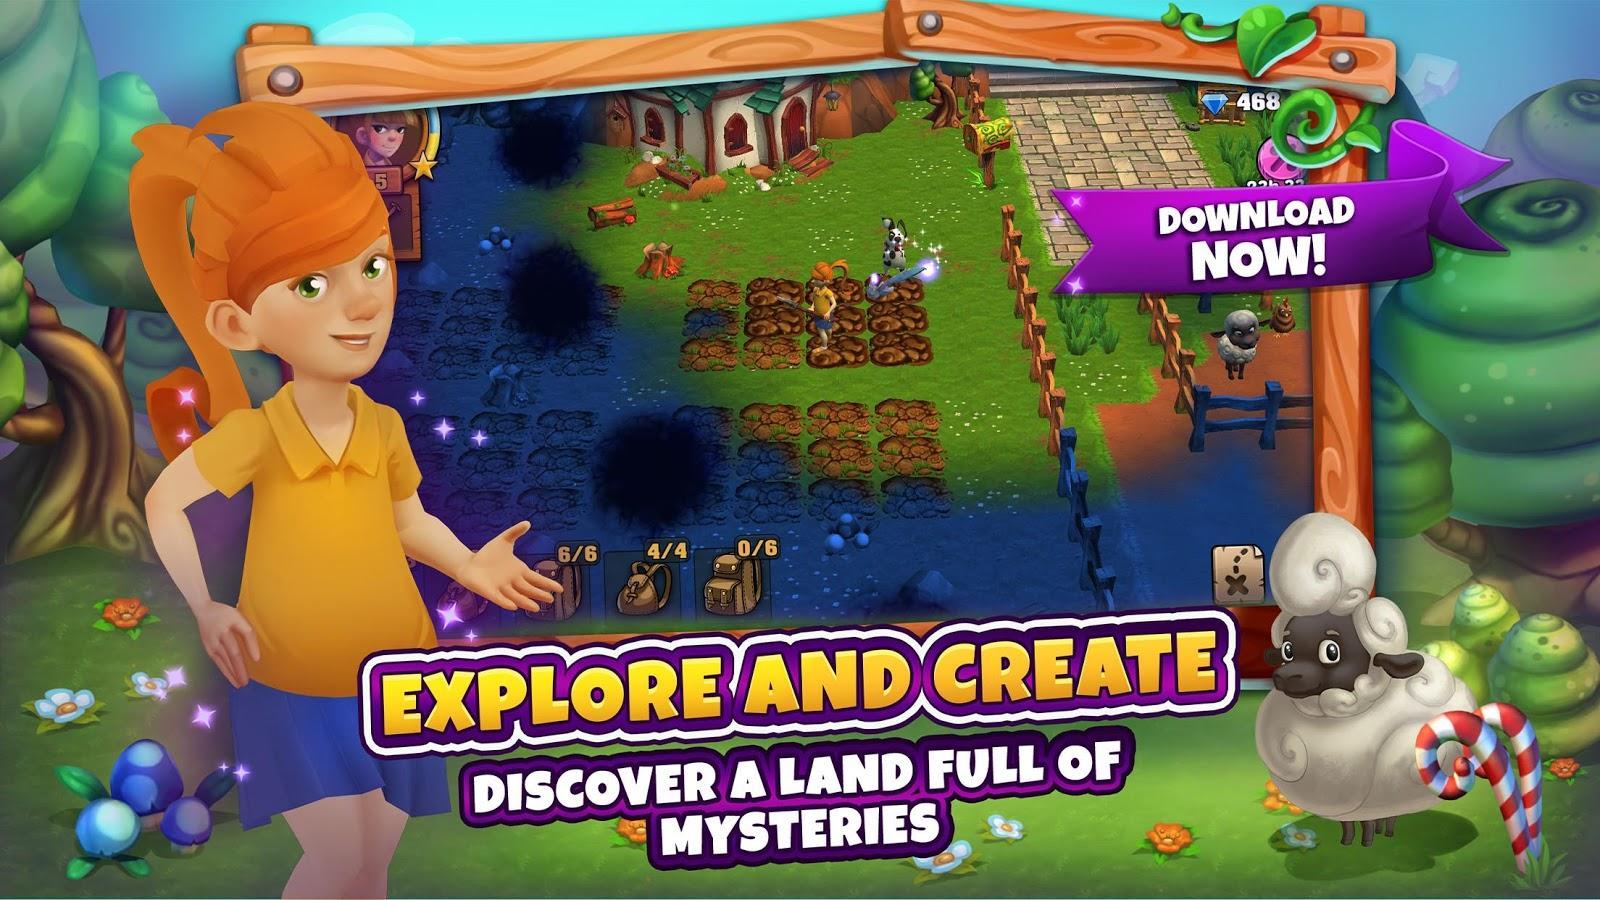 upjers Wonderland Screenshot